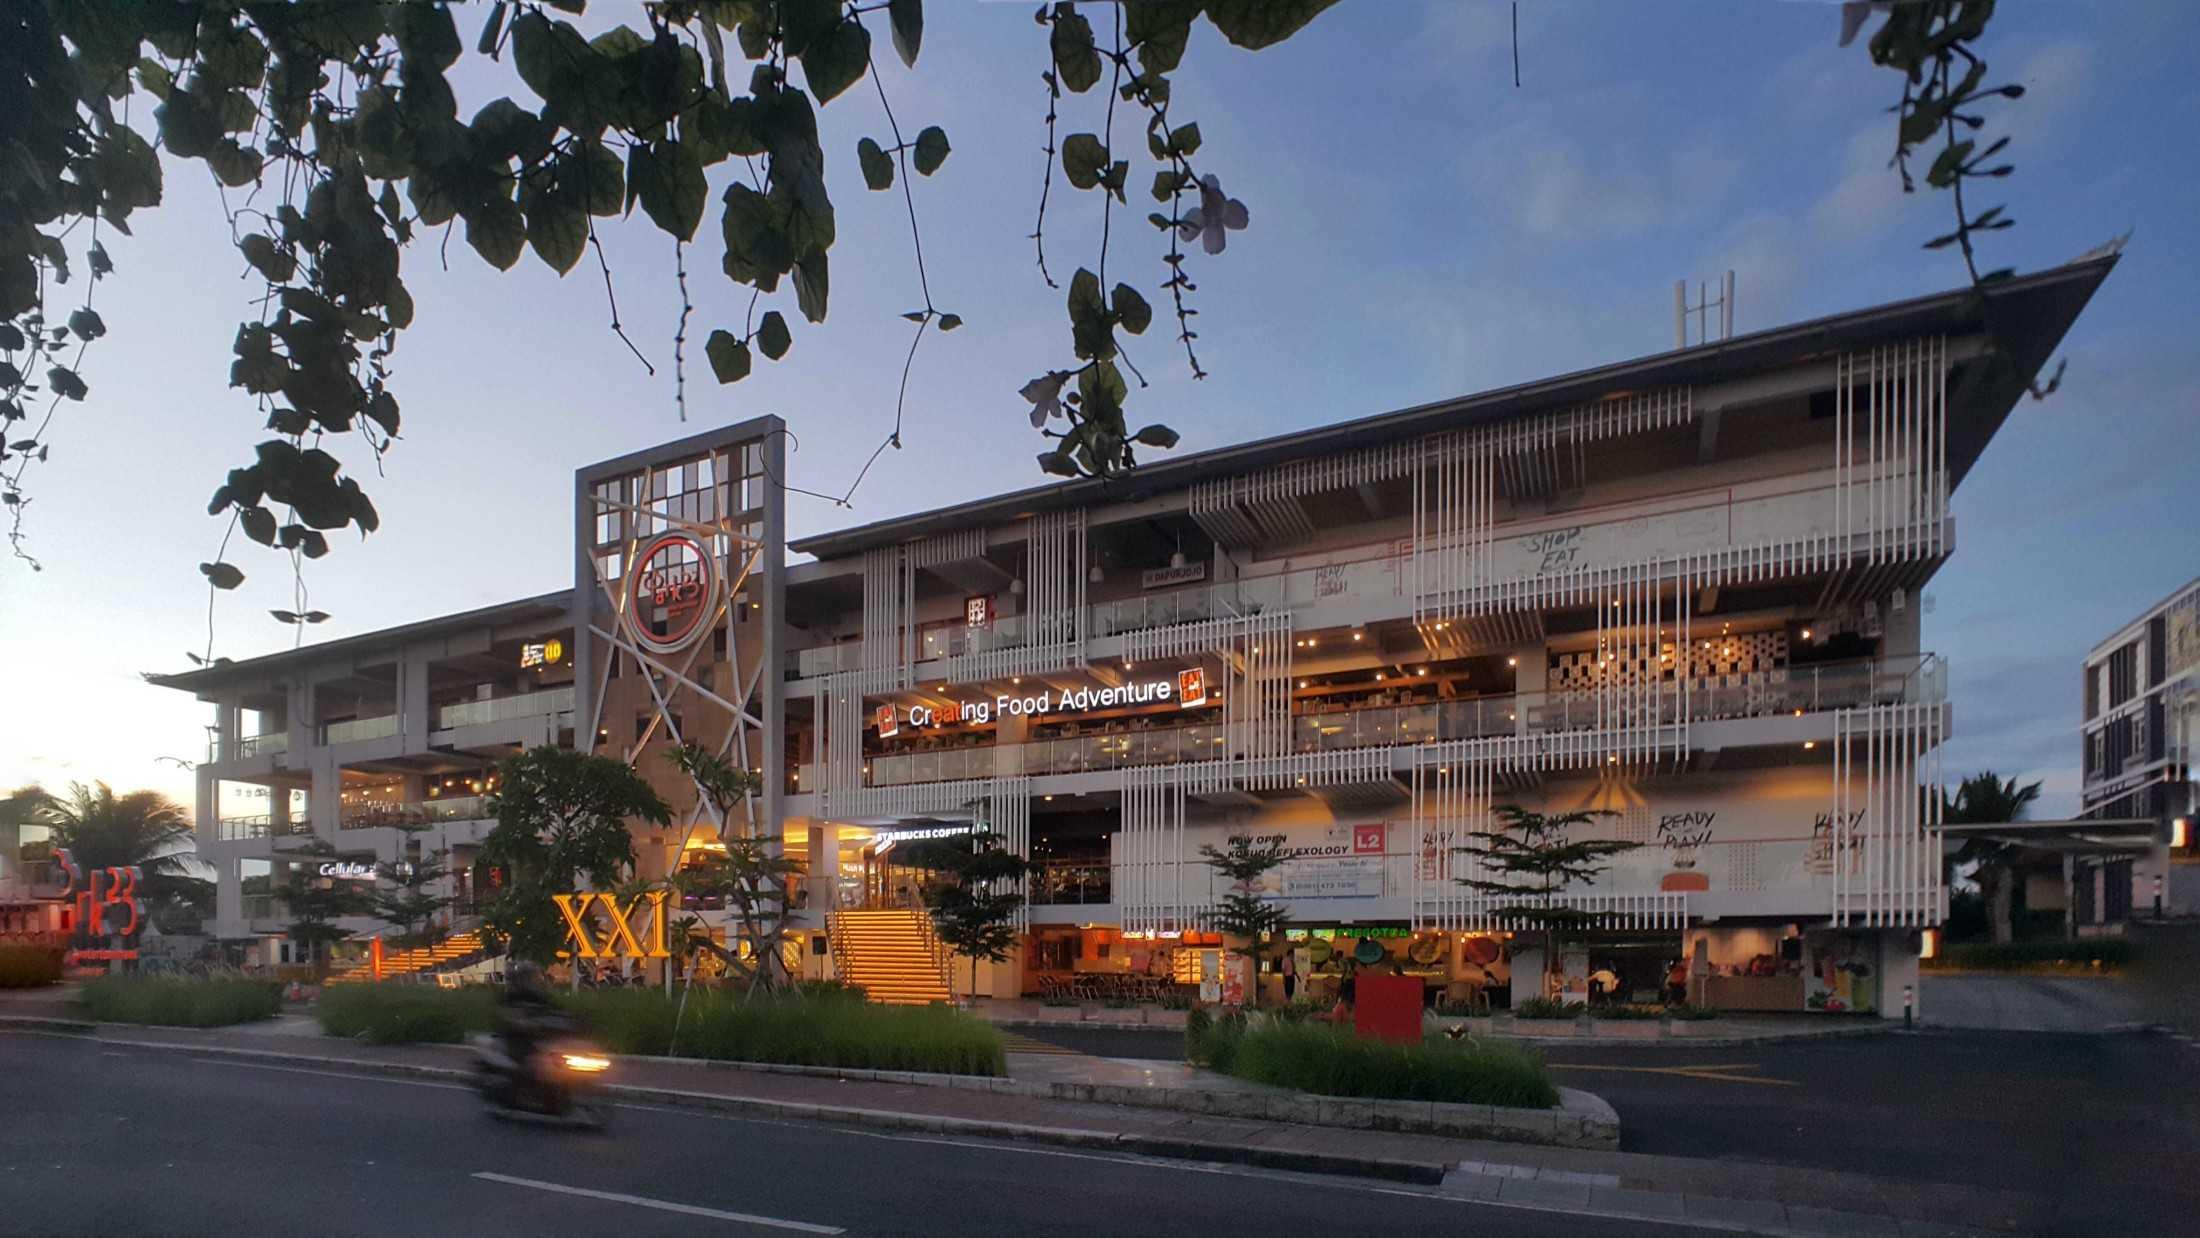 Parametr Rupacita Park Mall 23, Bali Kuta, Kabupaten Badung, Bali, Indonesia Kuta, Kabupaten Badung, Bali, Indonesia Parametr-Rupacita-Park-Mall-23  57729